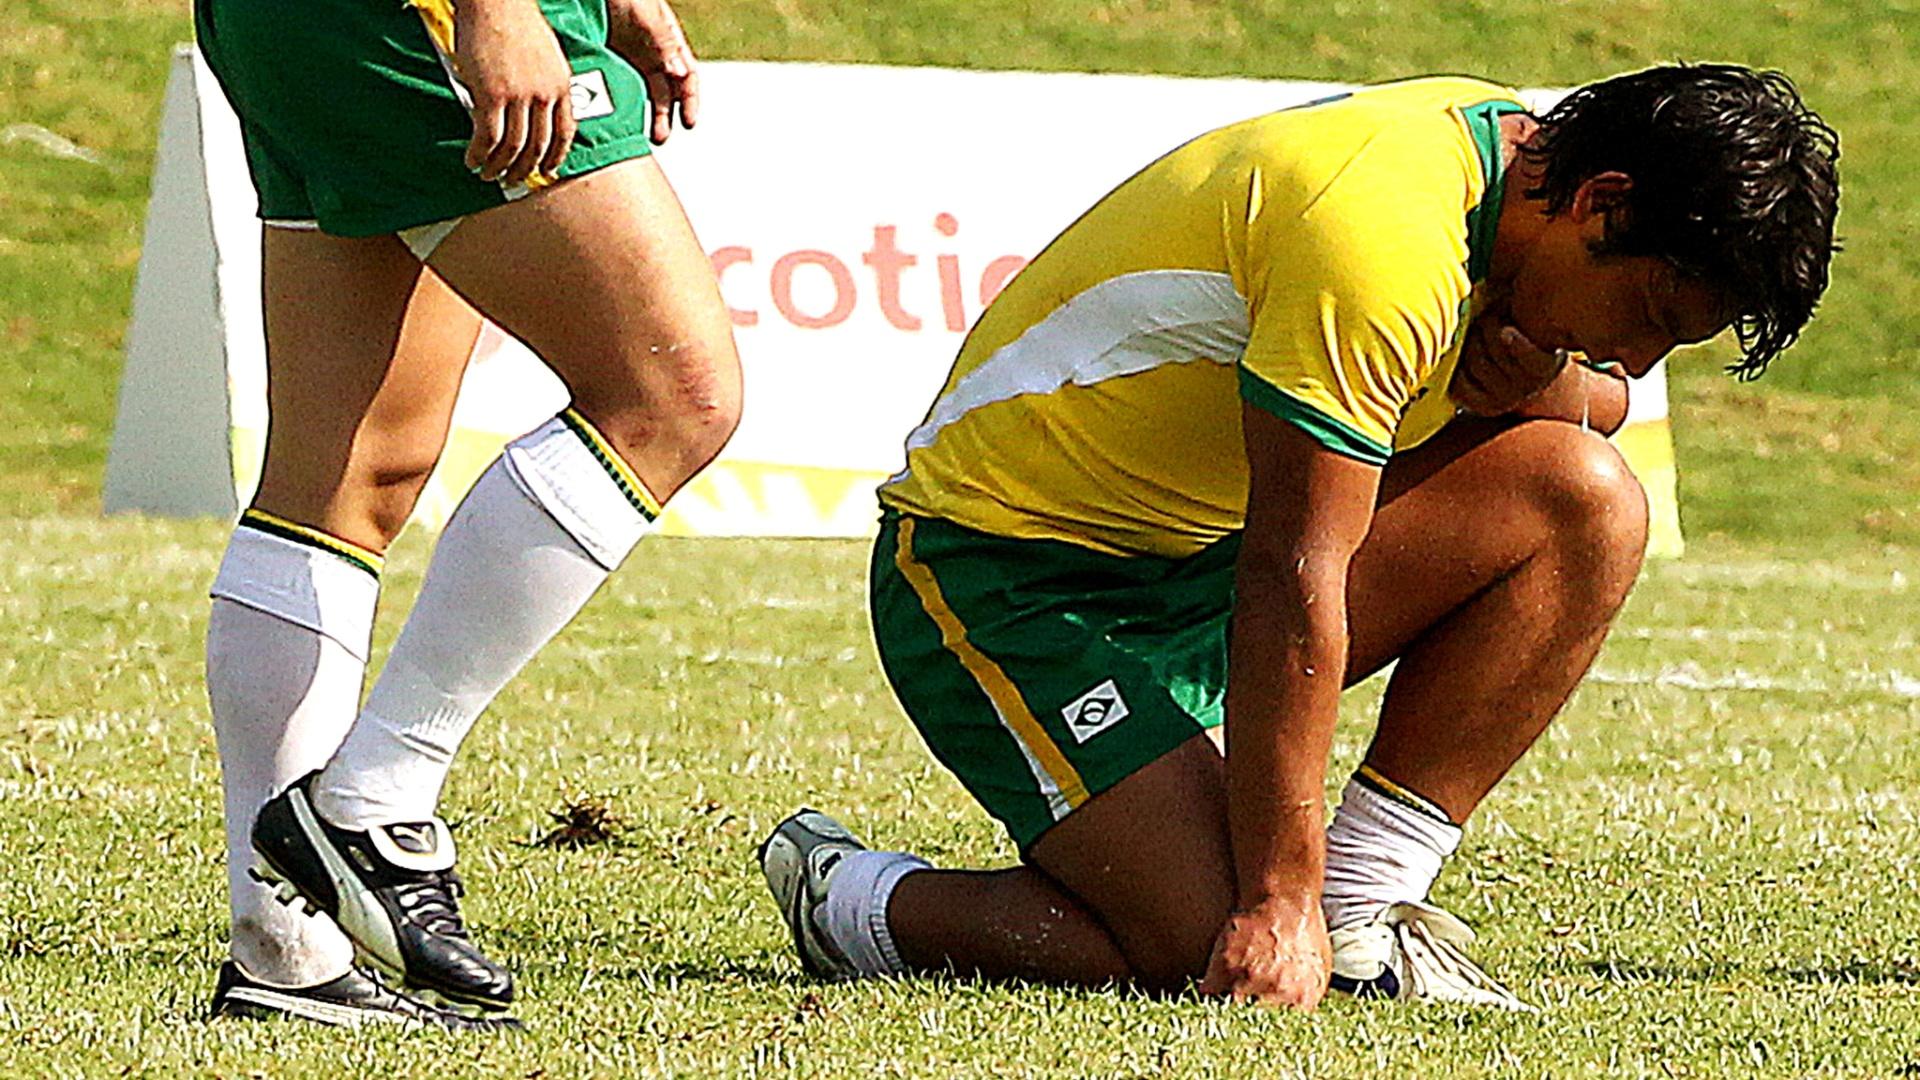 Jogador brasileiro lamenta derrota no rúgbi no Pan (30/10/2011)